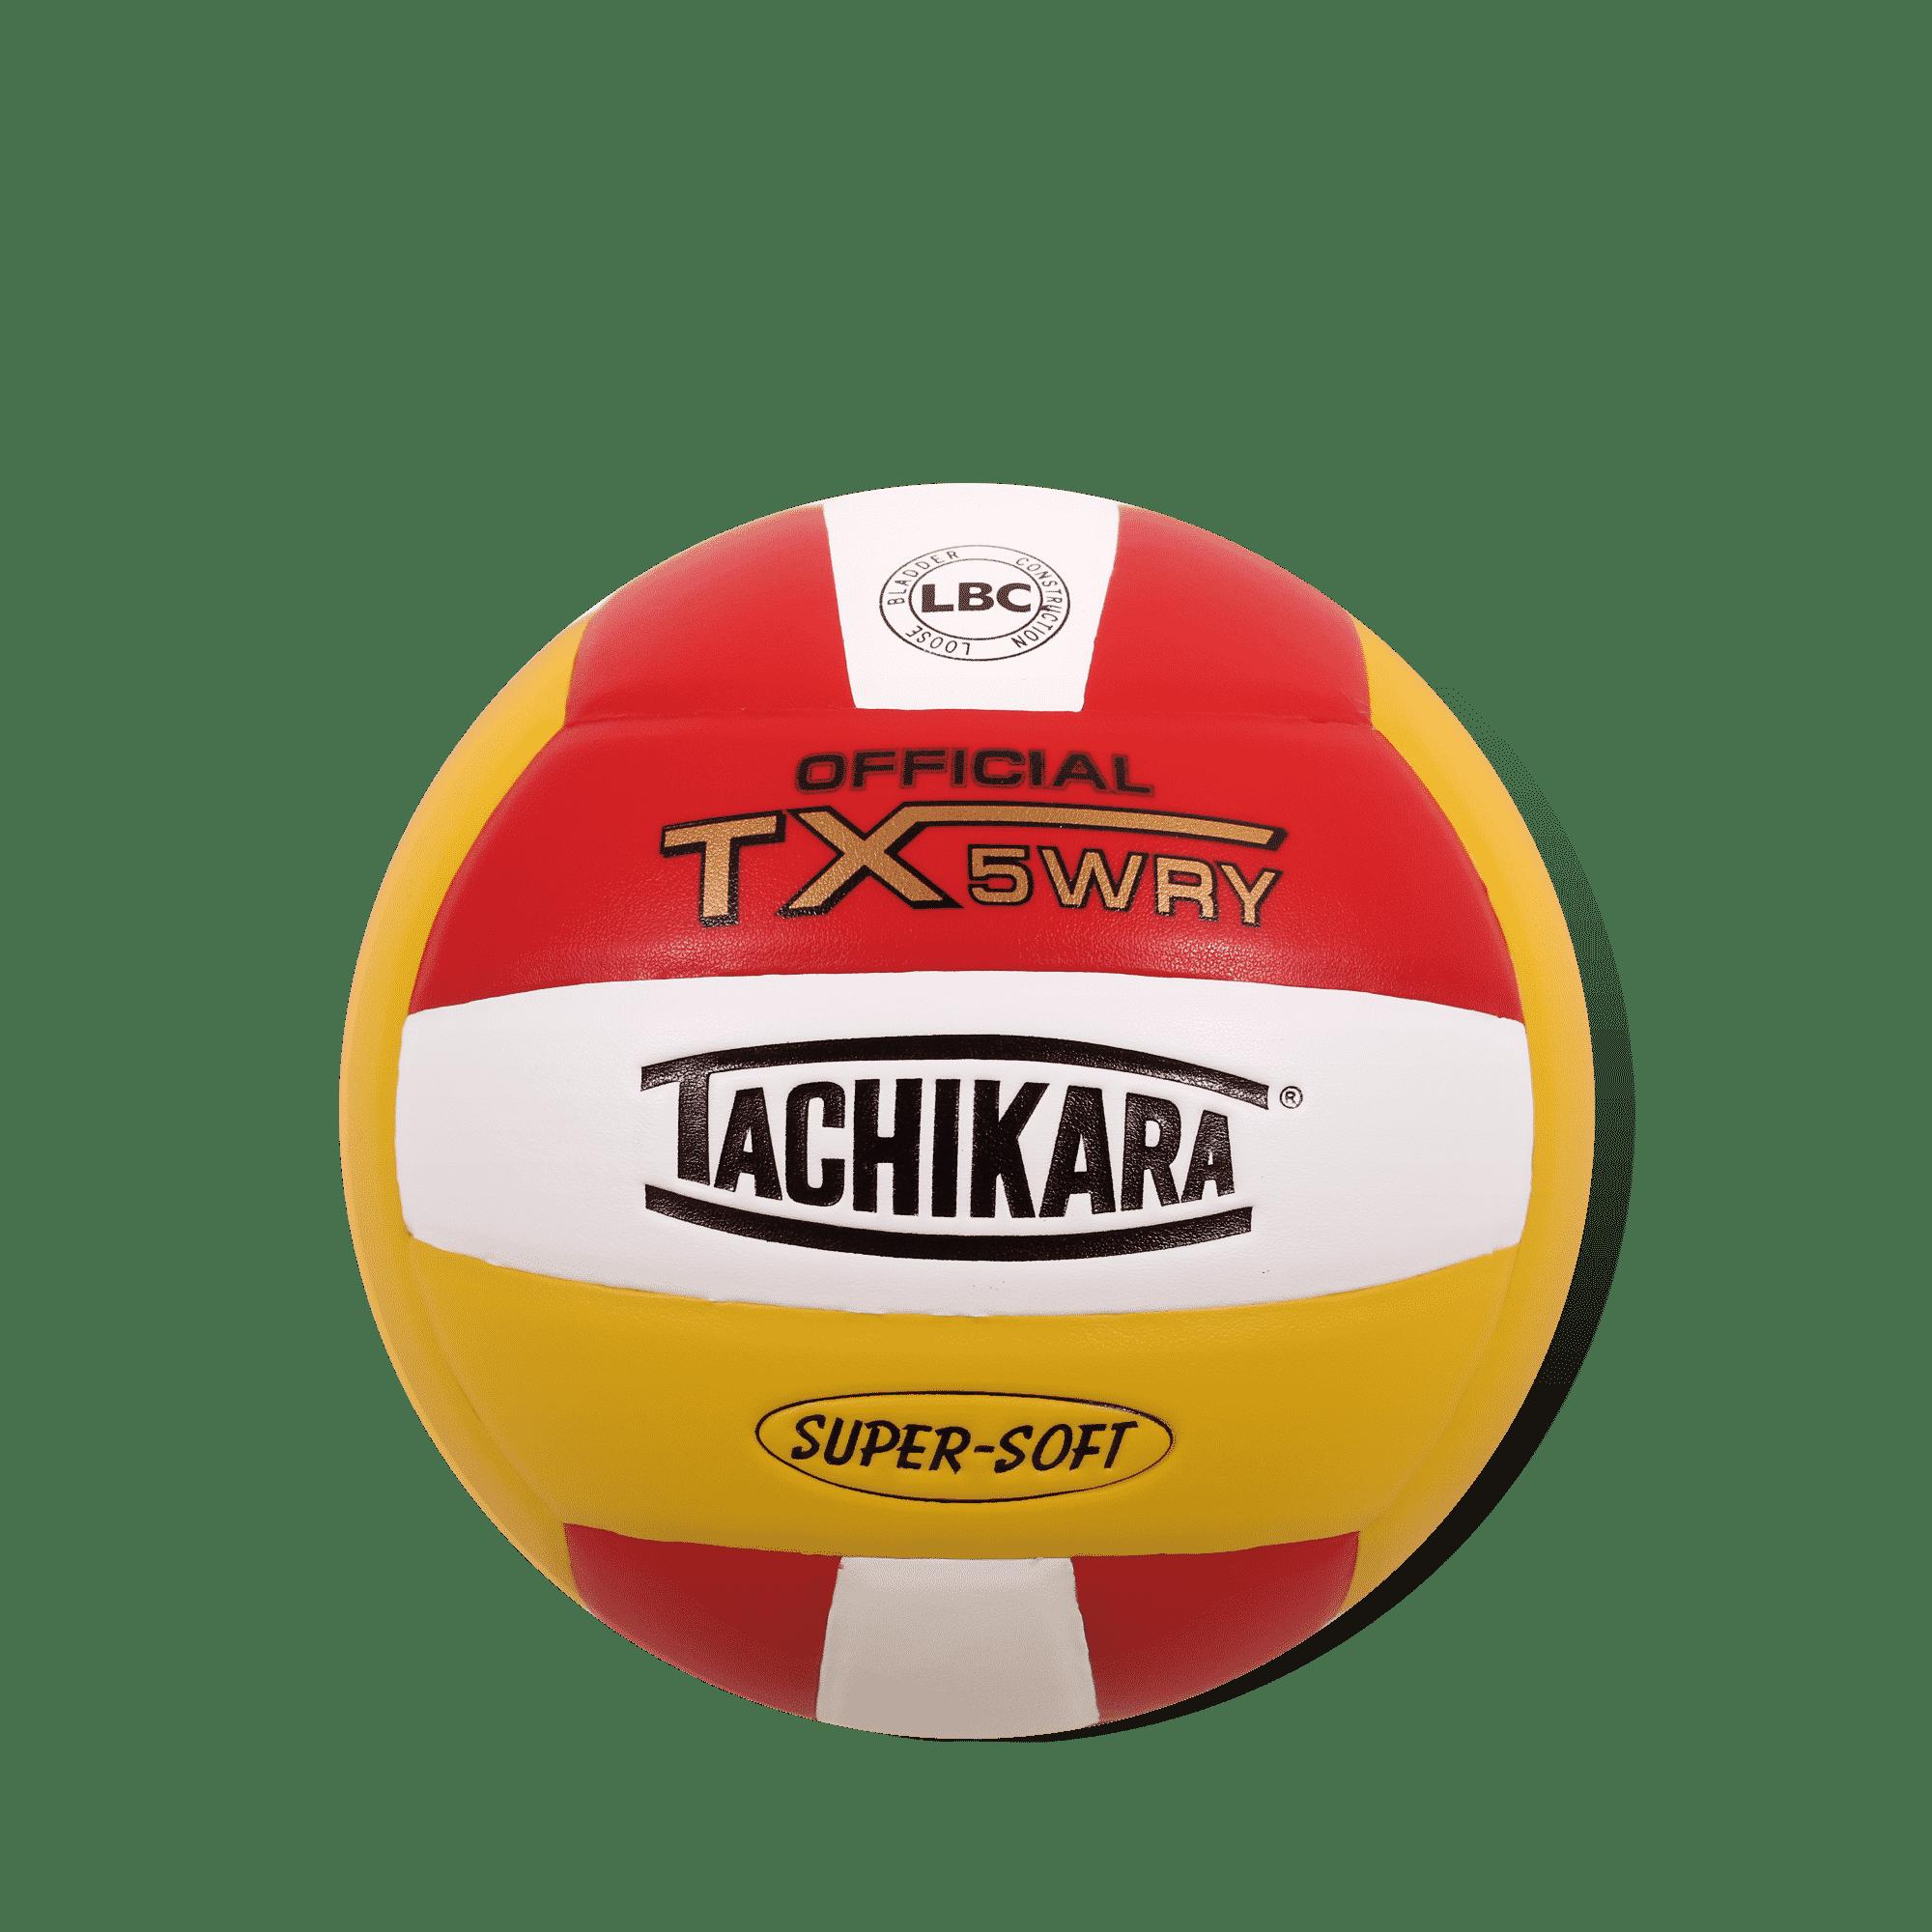 Tachikara-TX5WRY